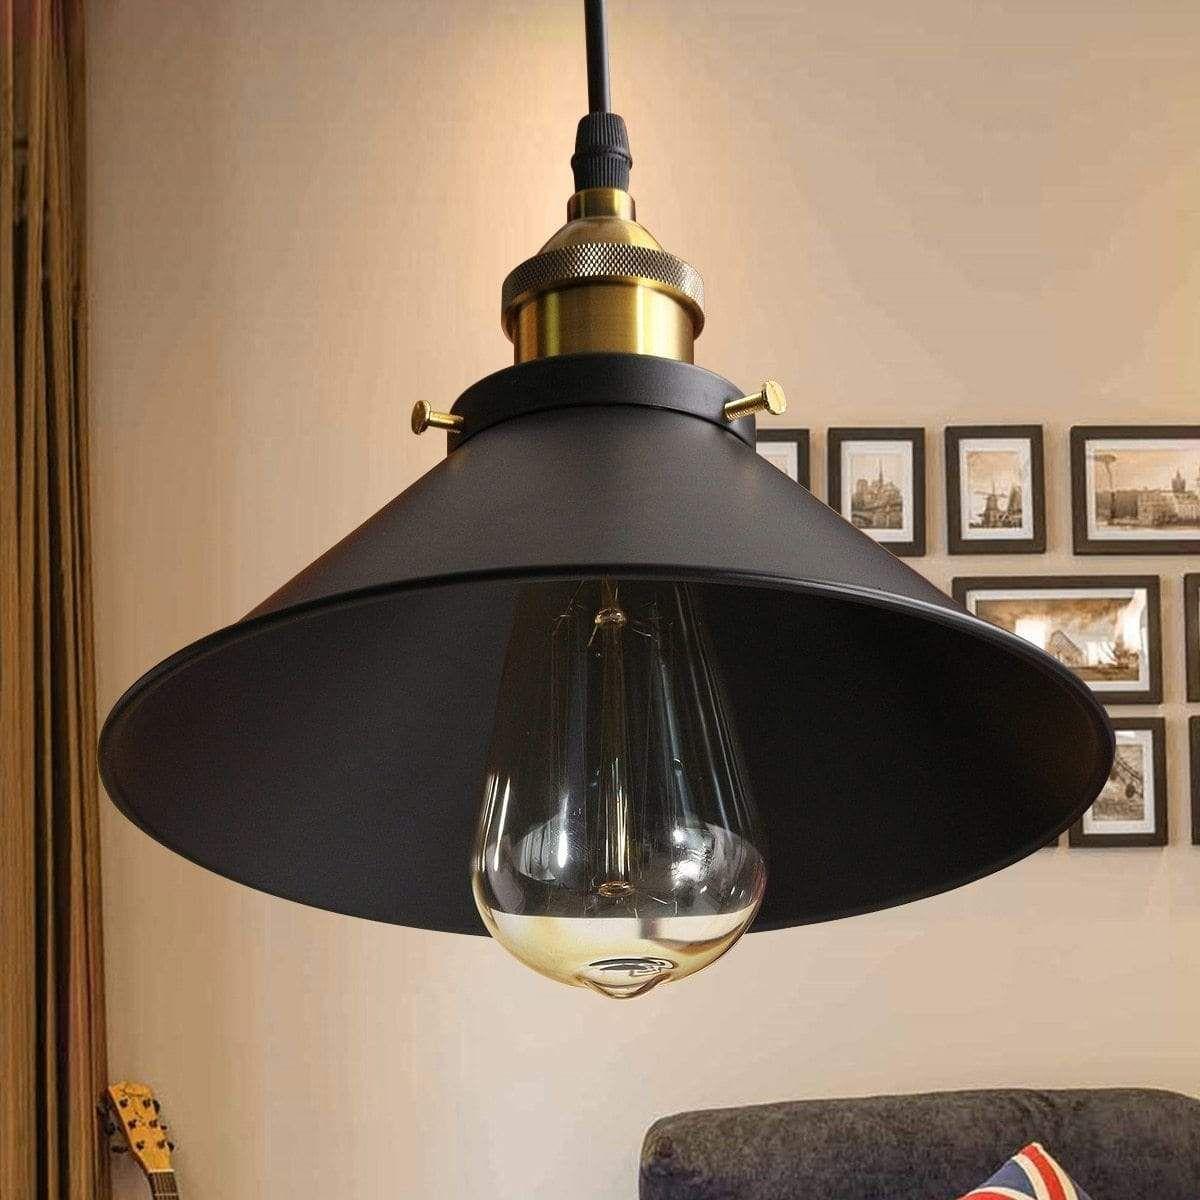 American Edison Retro Ceiling Lamp Pendant Light Fixtures Modern Ceiling Lamps Rustic Pendant Lighting